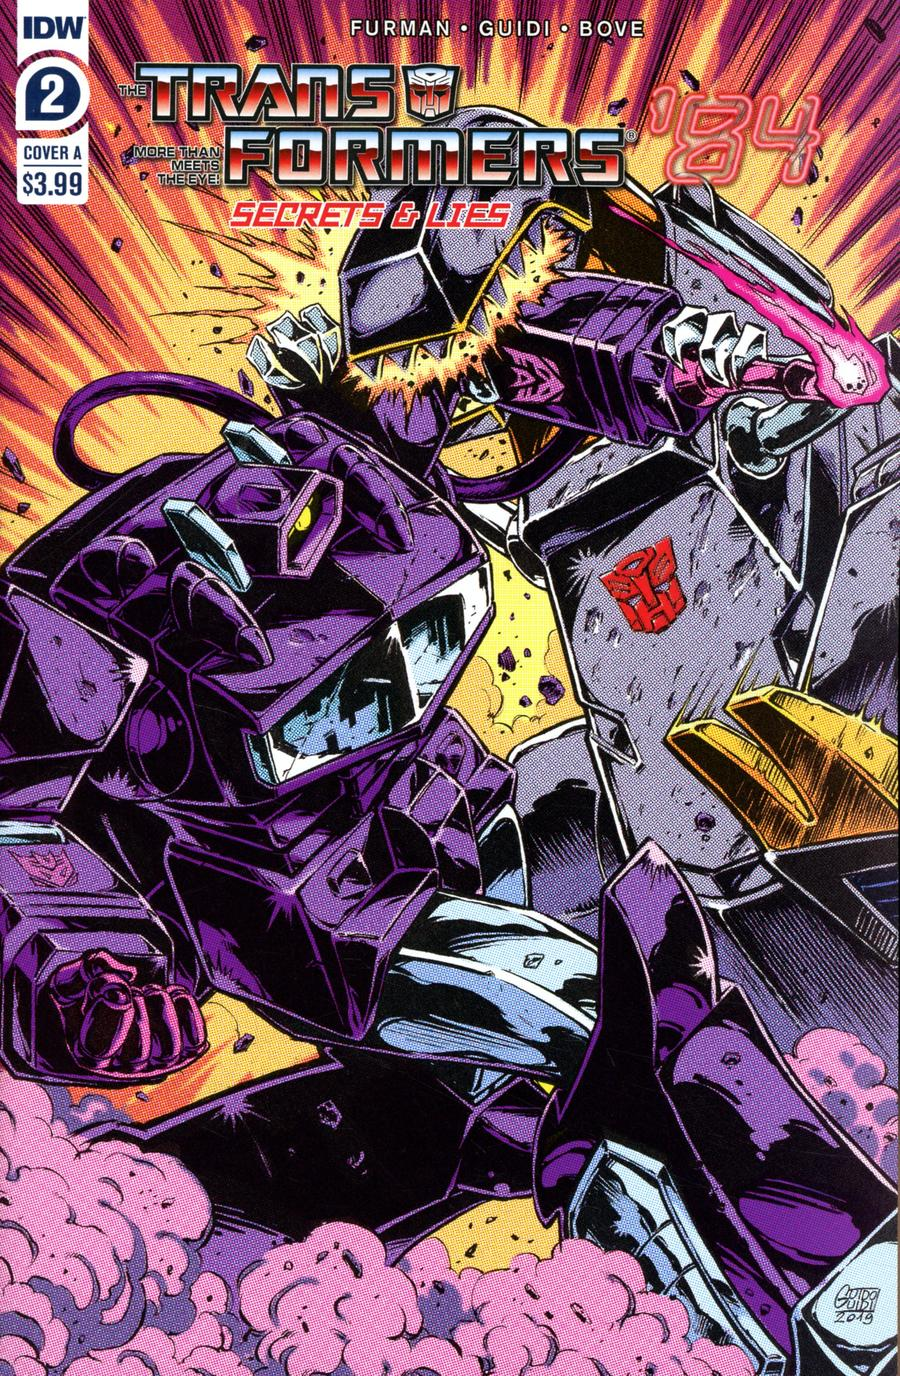 Transformers 84 Secrets And Lies #2 Cover A Regular Guido Guidi Cover